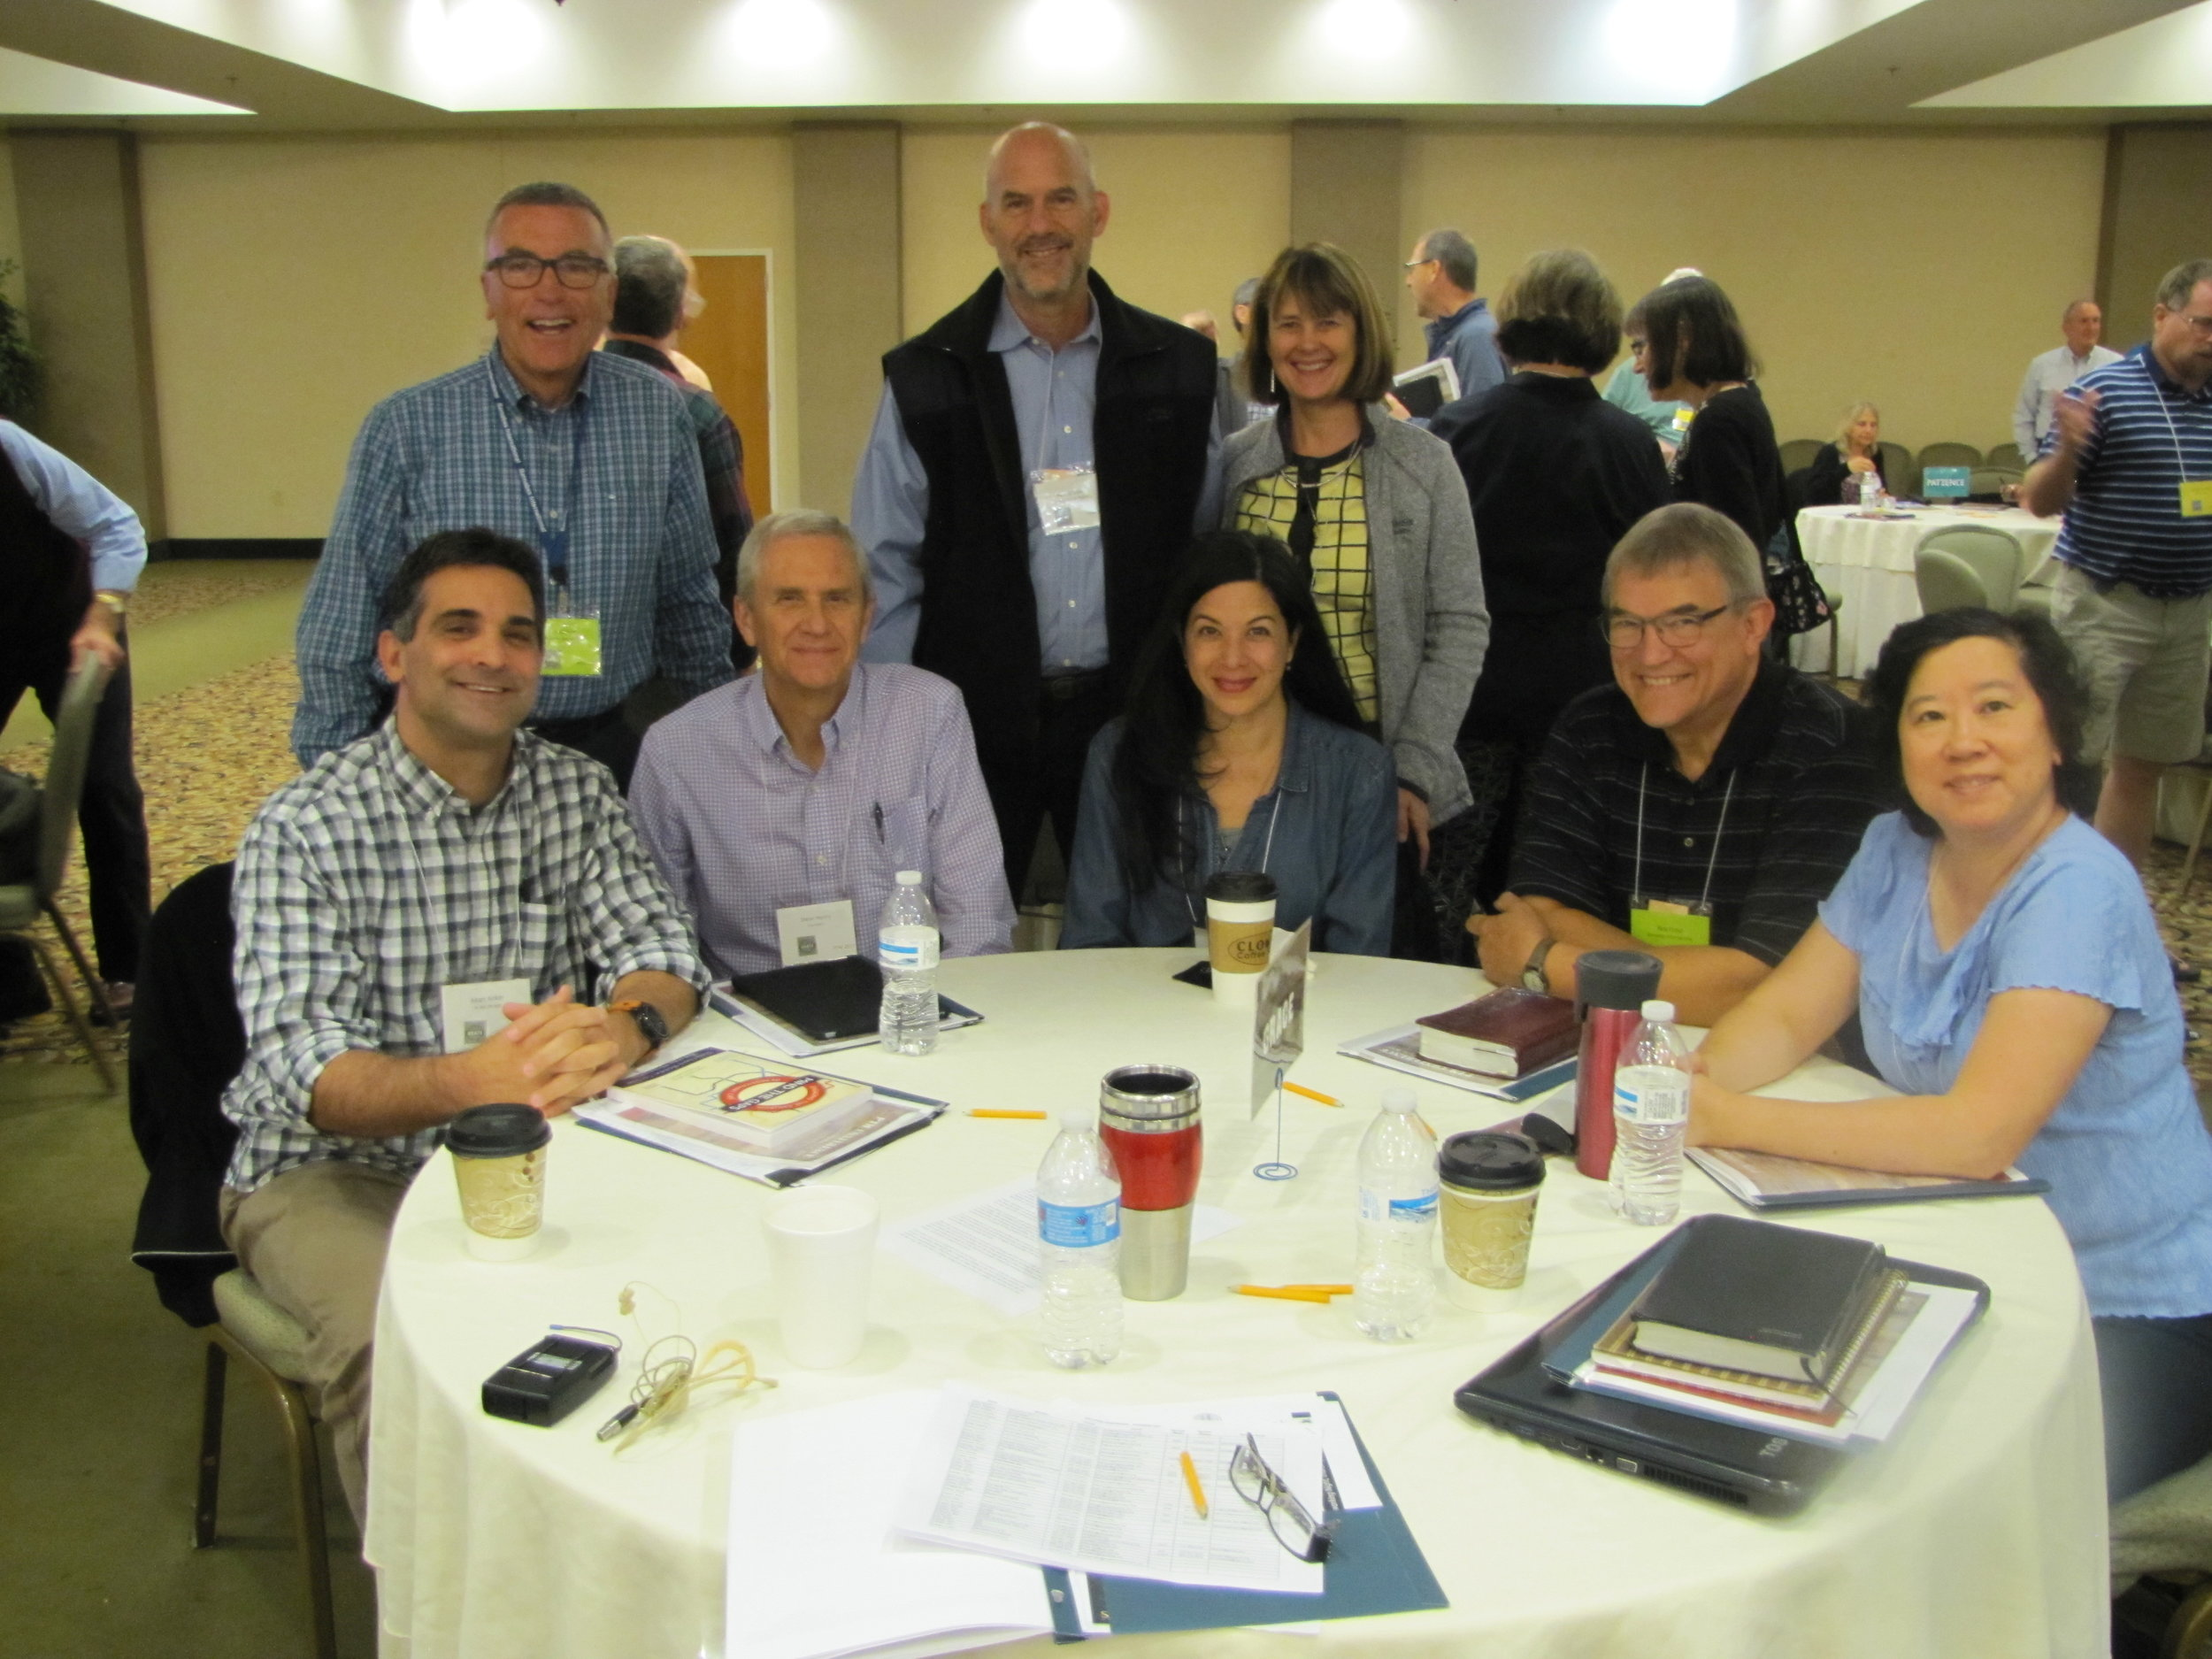 17-10-05-ridgecrest PTM conference (18).JPG